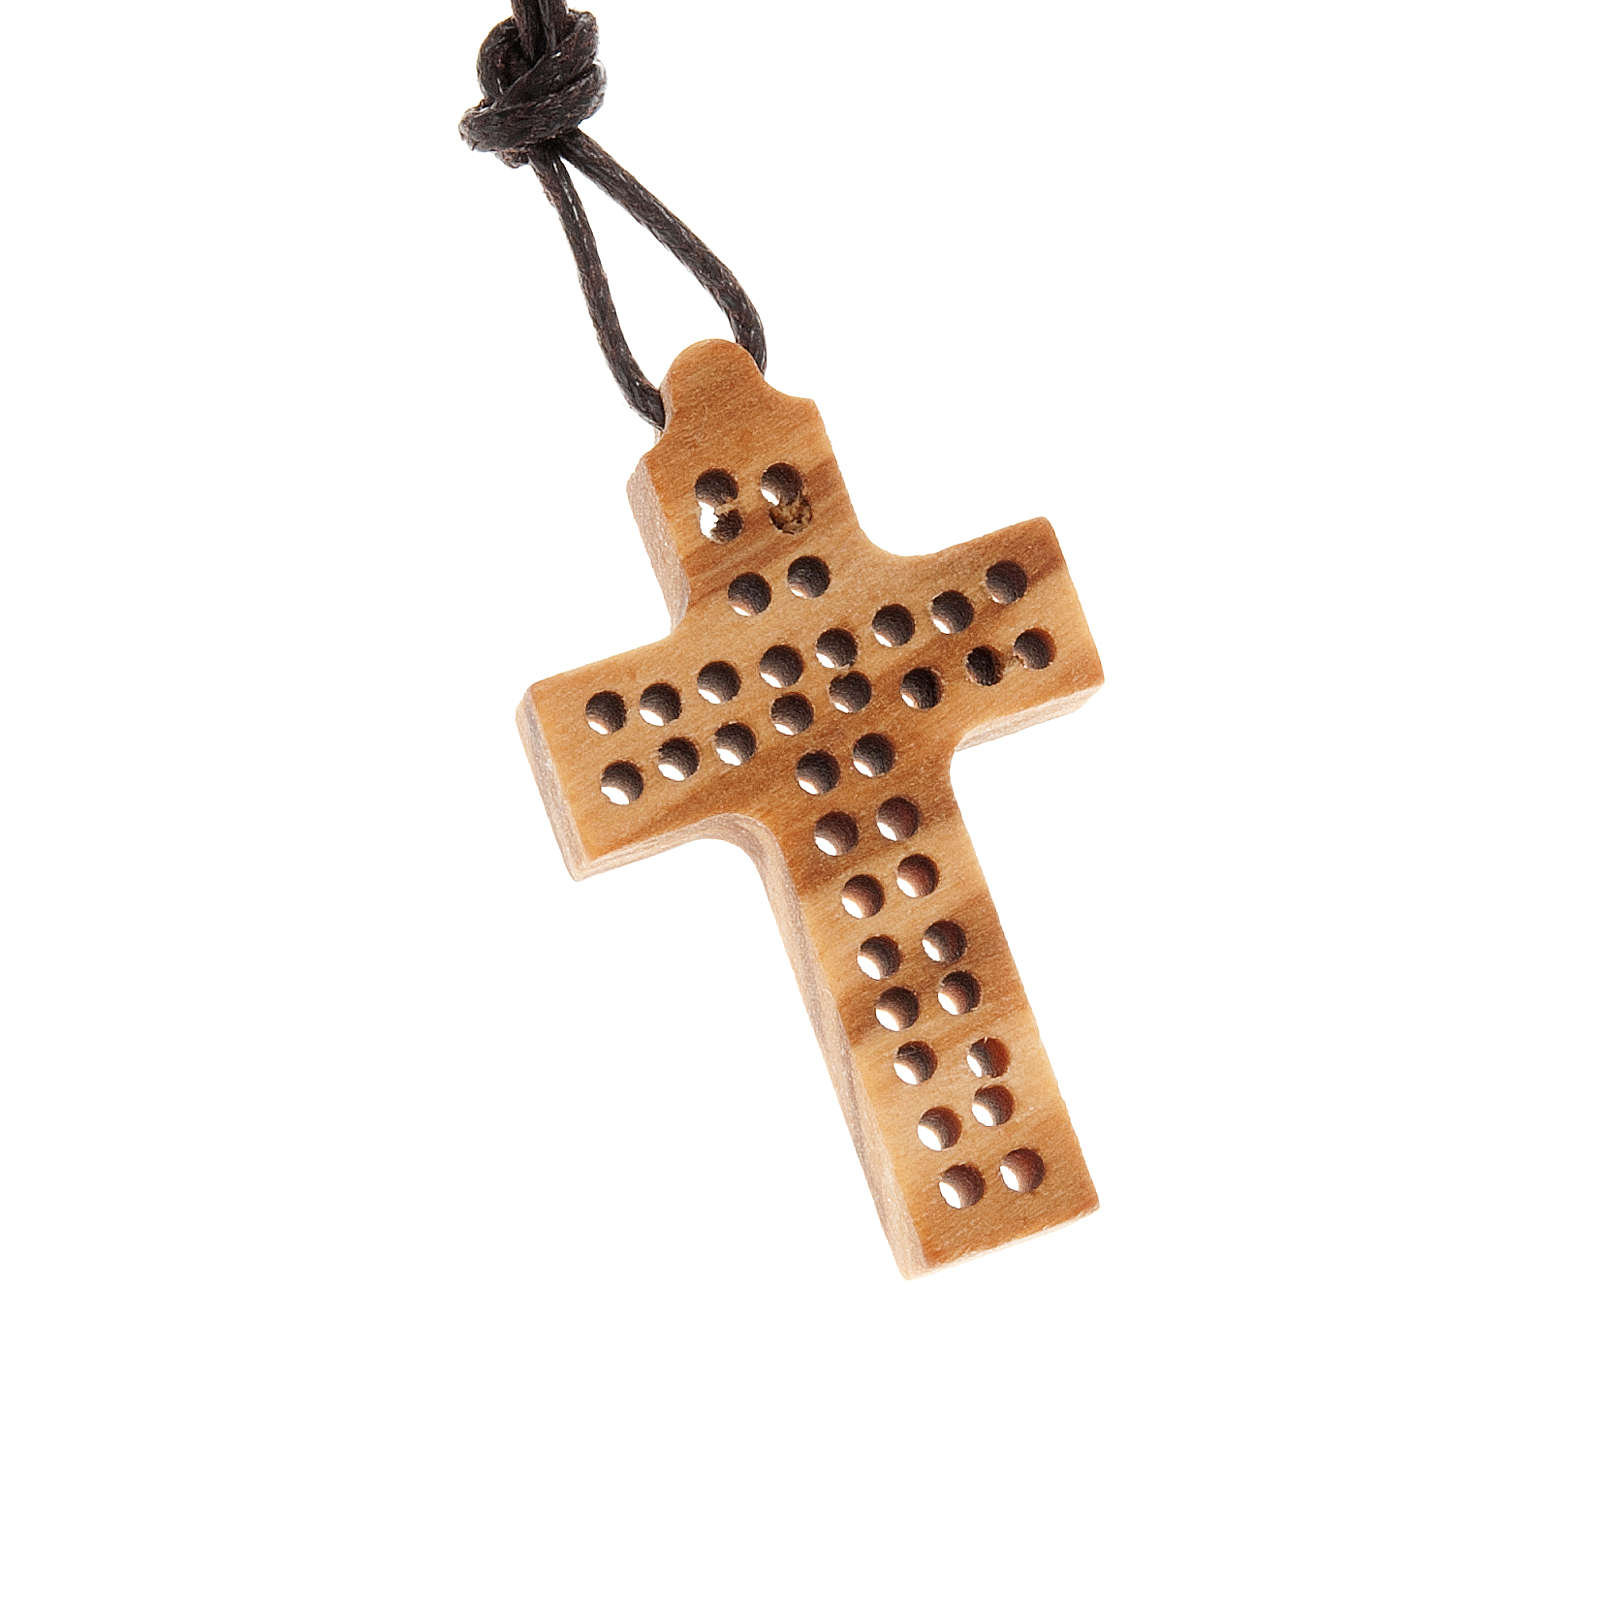 Löcherigen Kreuz 2 Linie 4